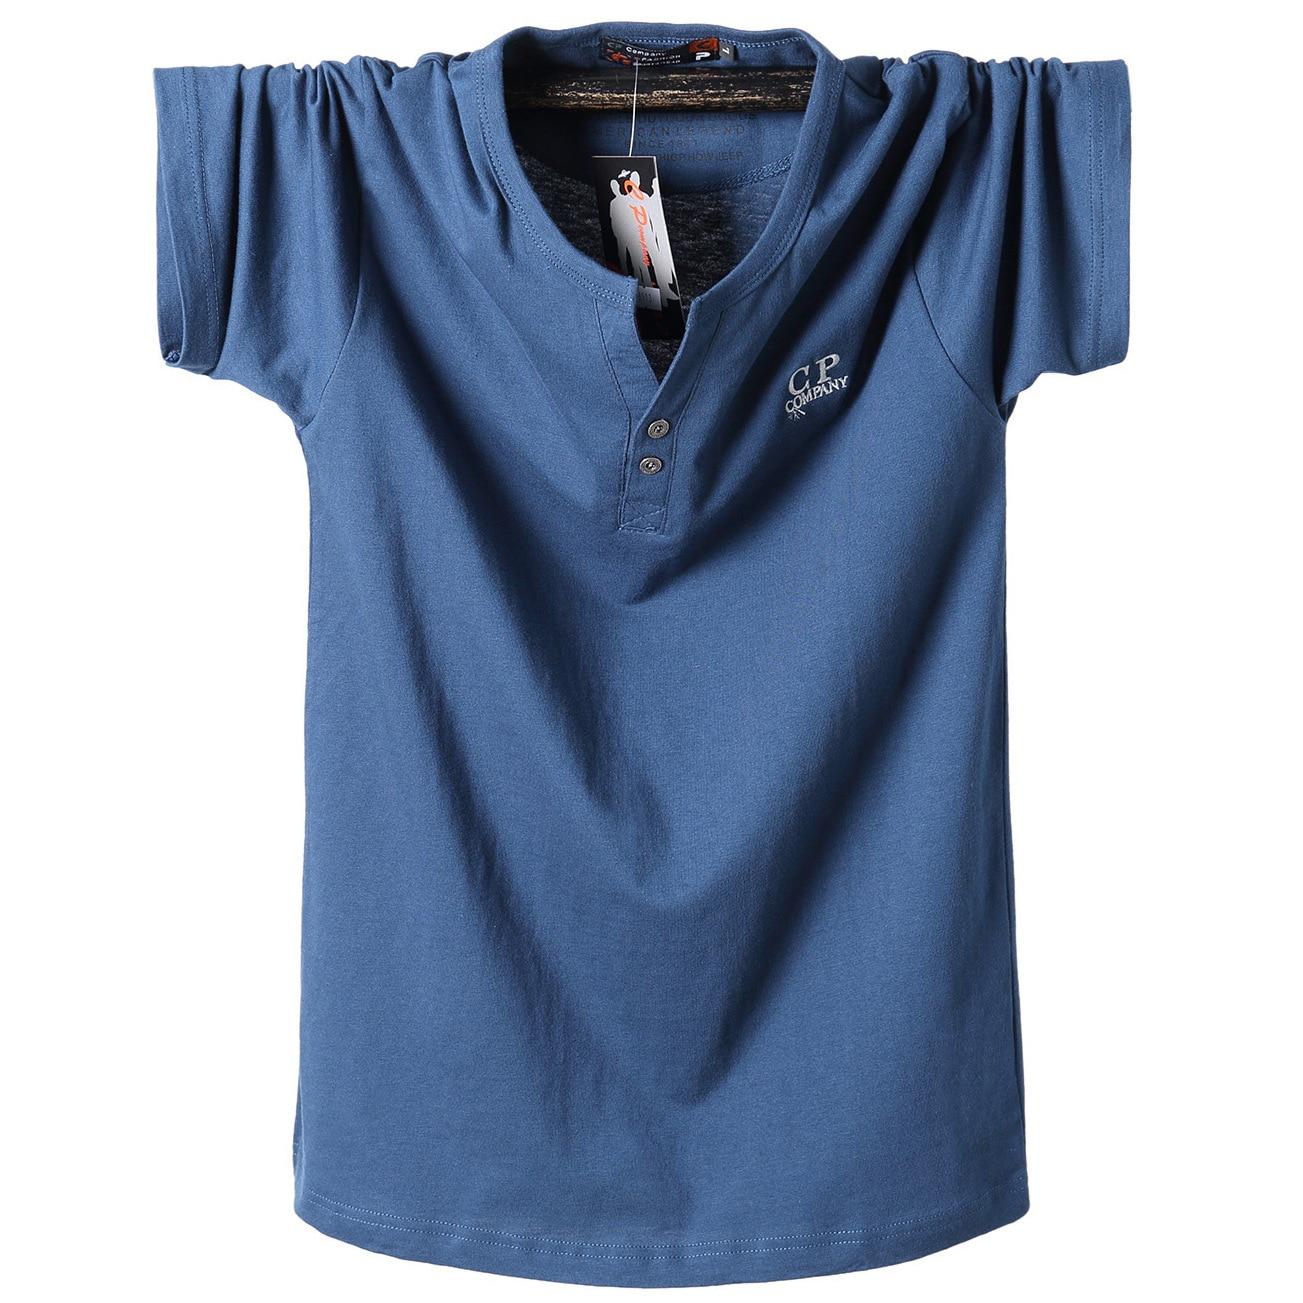 Summer New Plus T-shirts men Plus Size Short Sleeve T-Shirt Men Cotton Half Sleeved Casual T Shirt Extra Large size